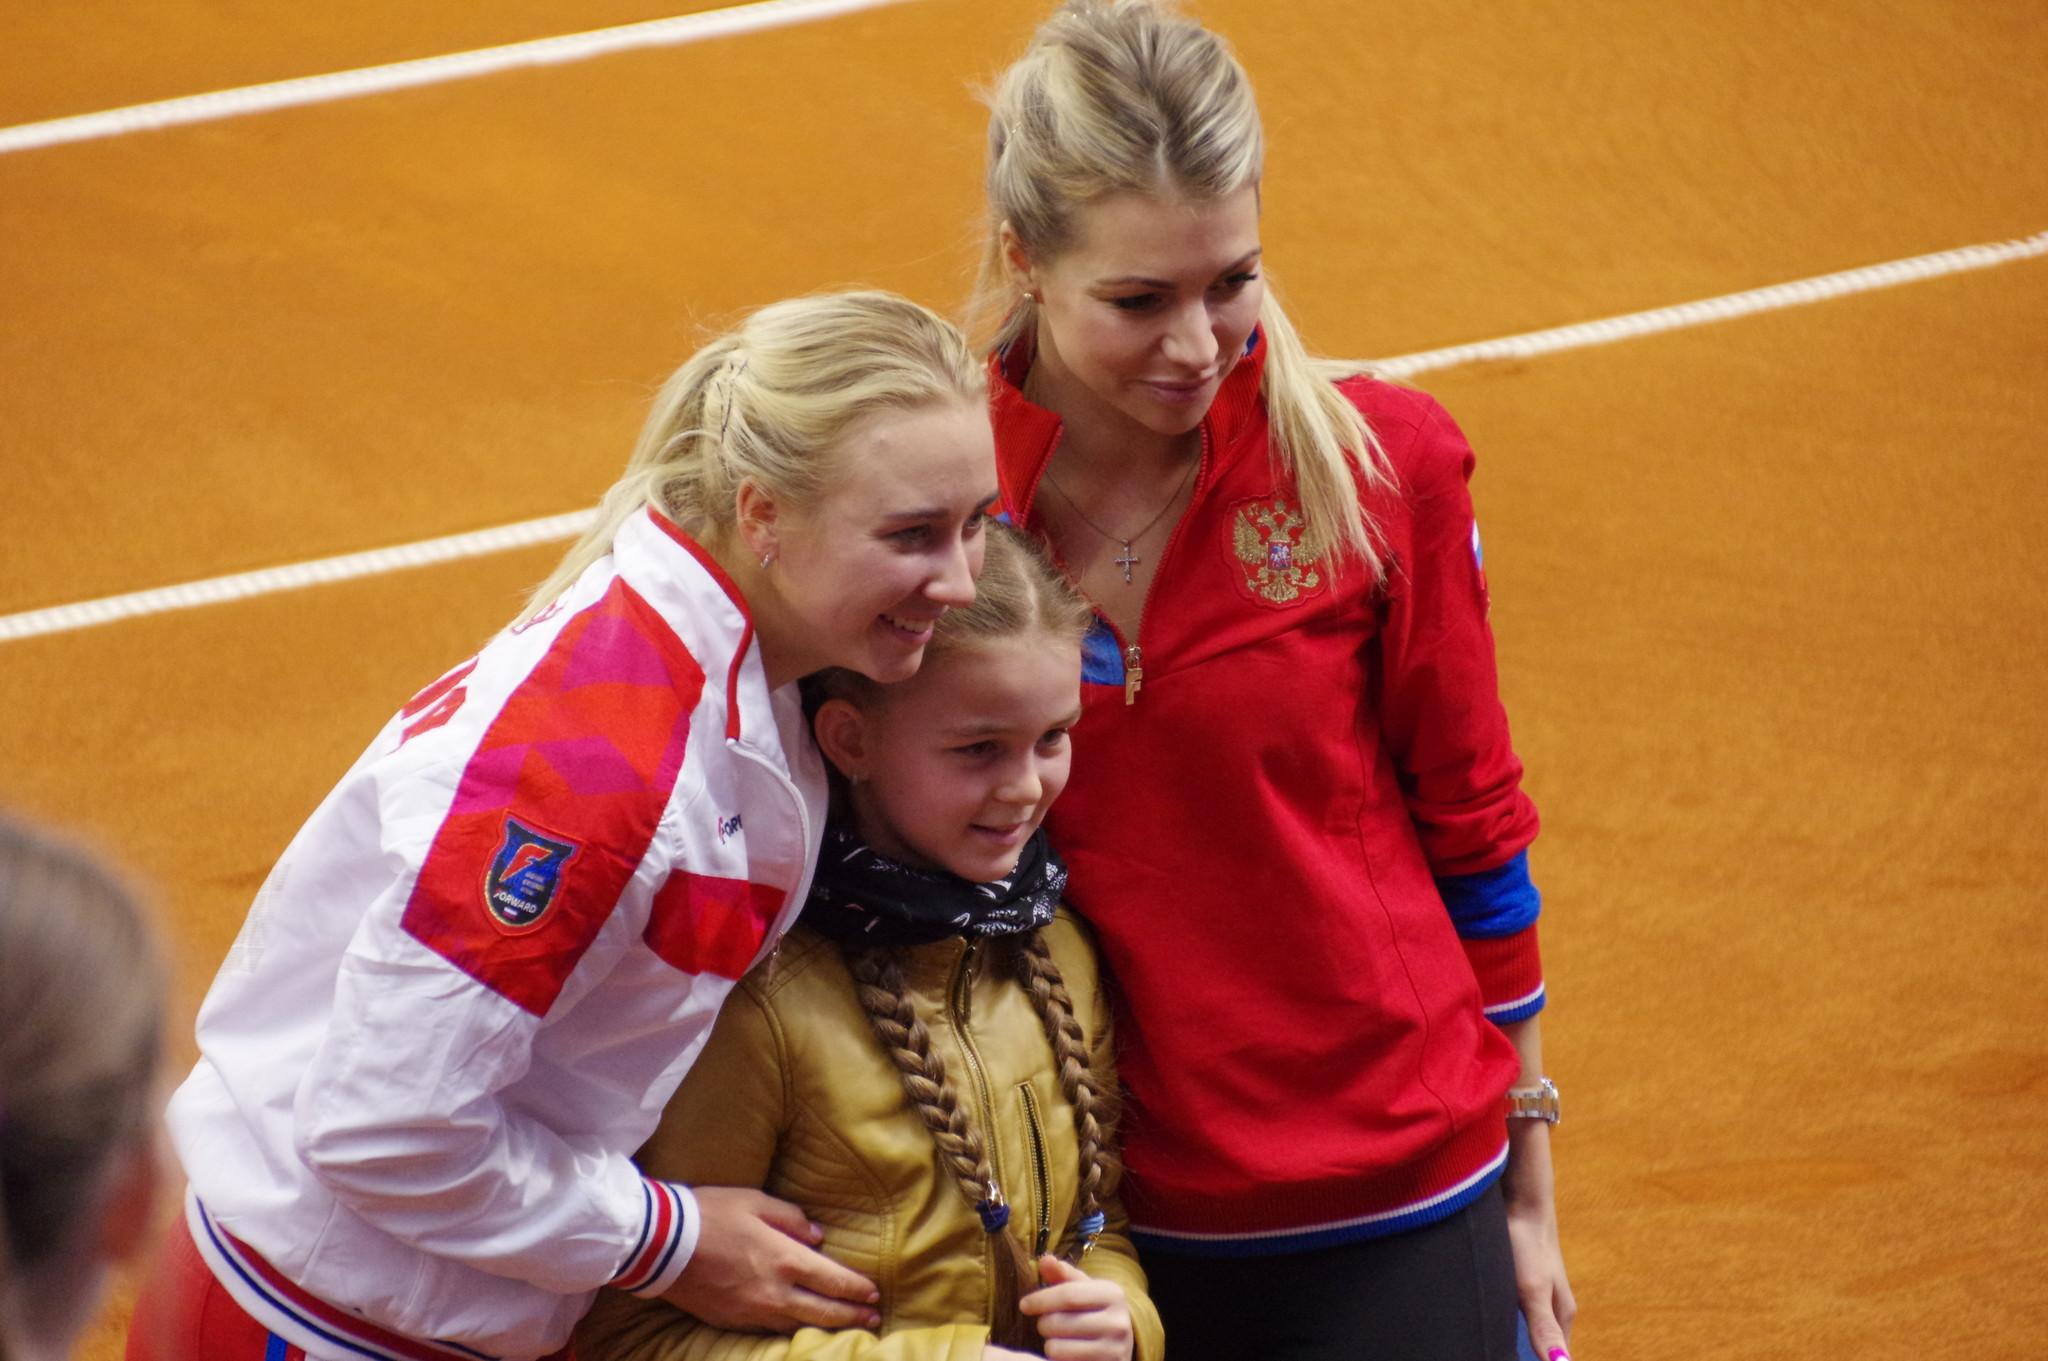 Анастасия Потапова и Мария Кириленко